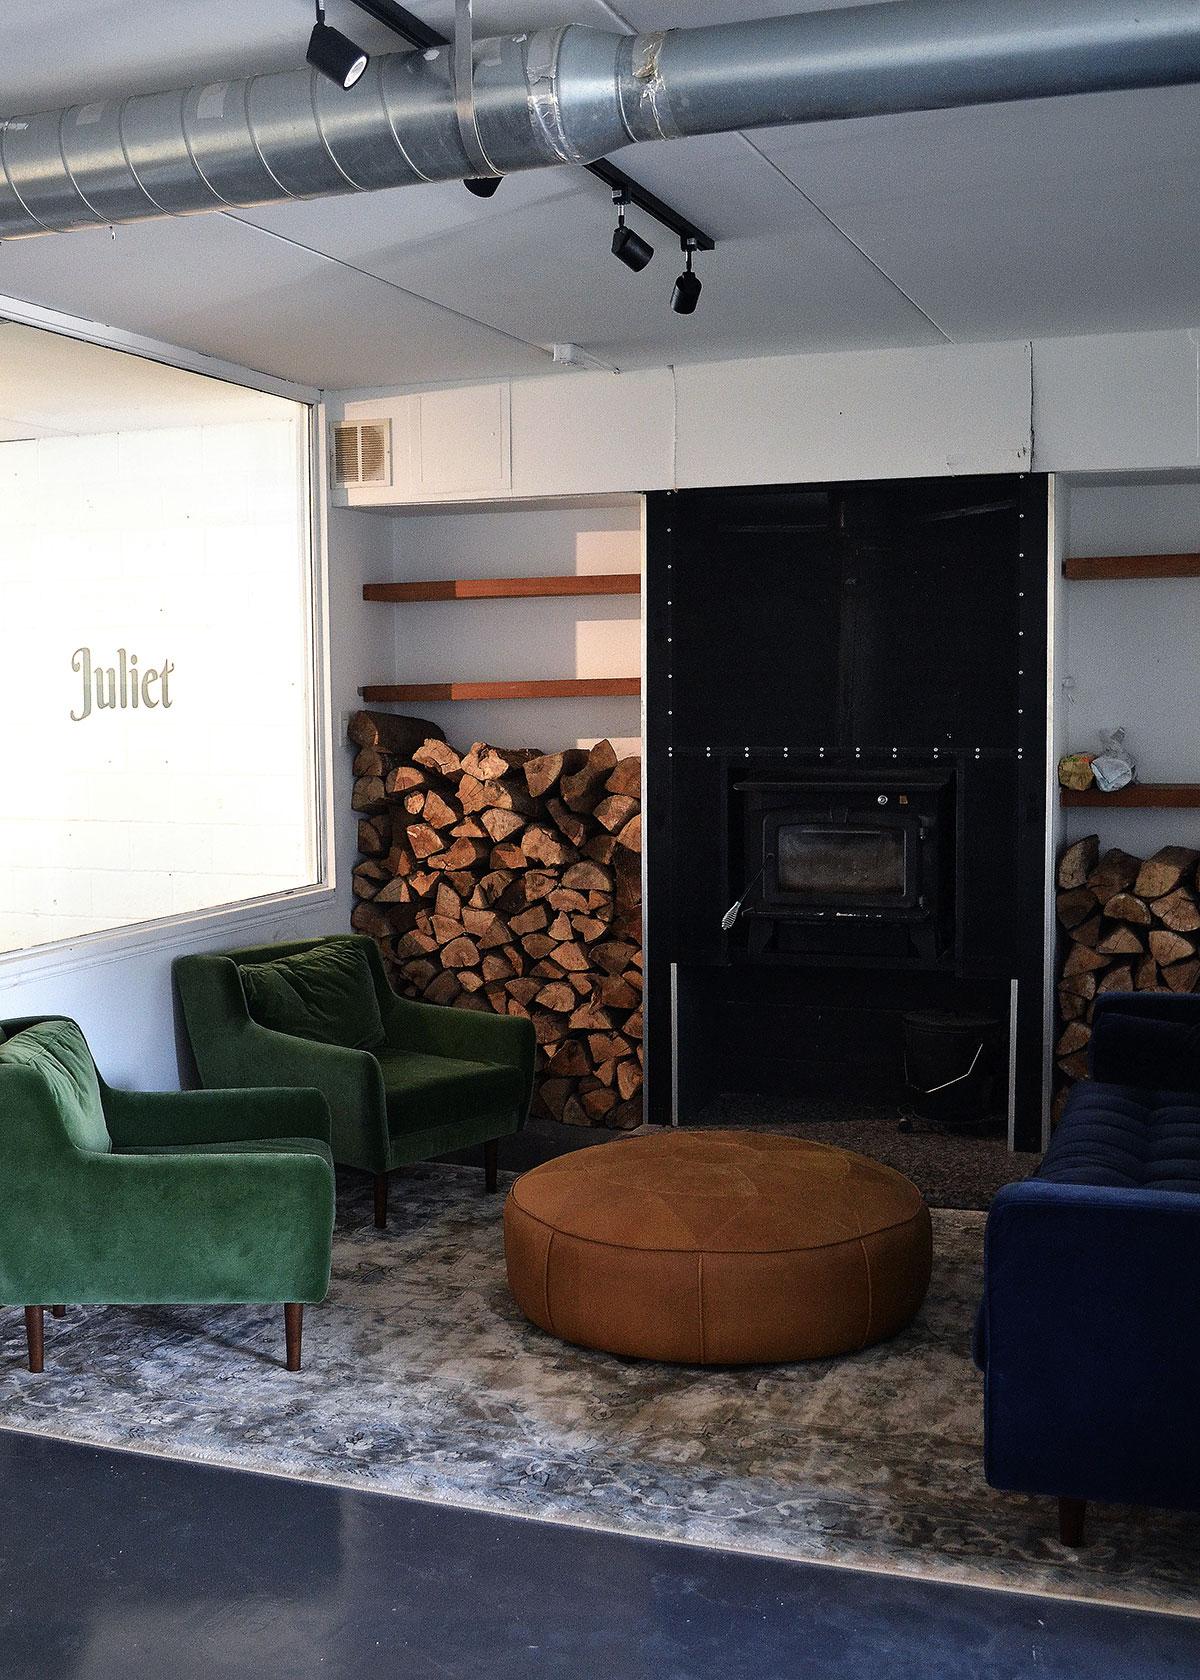 Juliet_Office_4